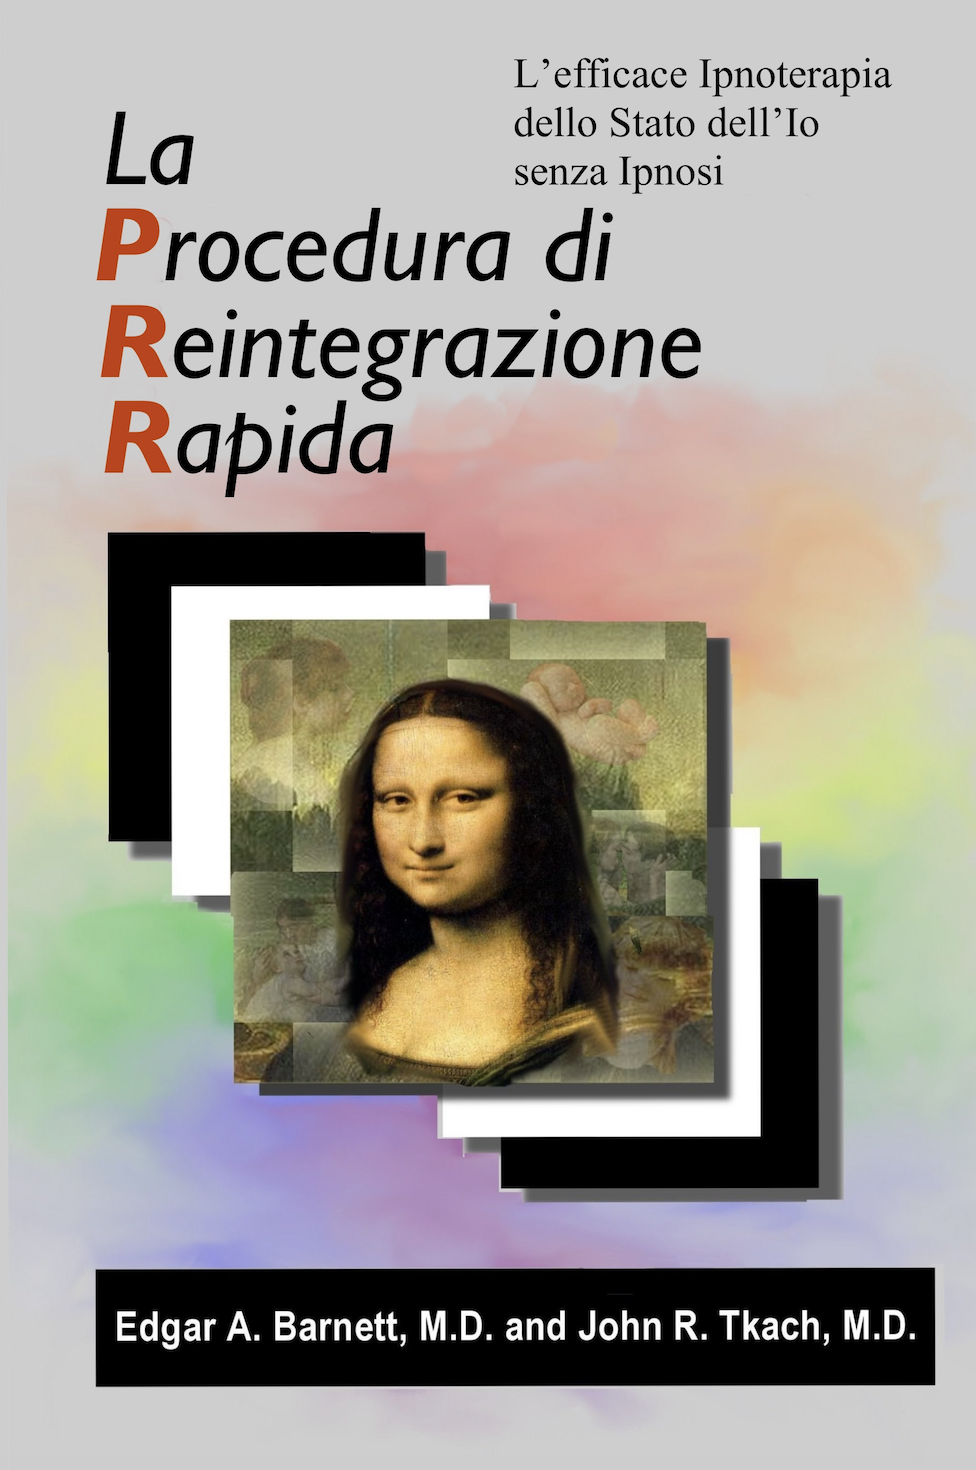 RRP Italian Cover